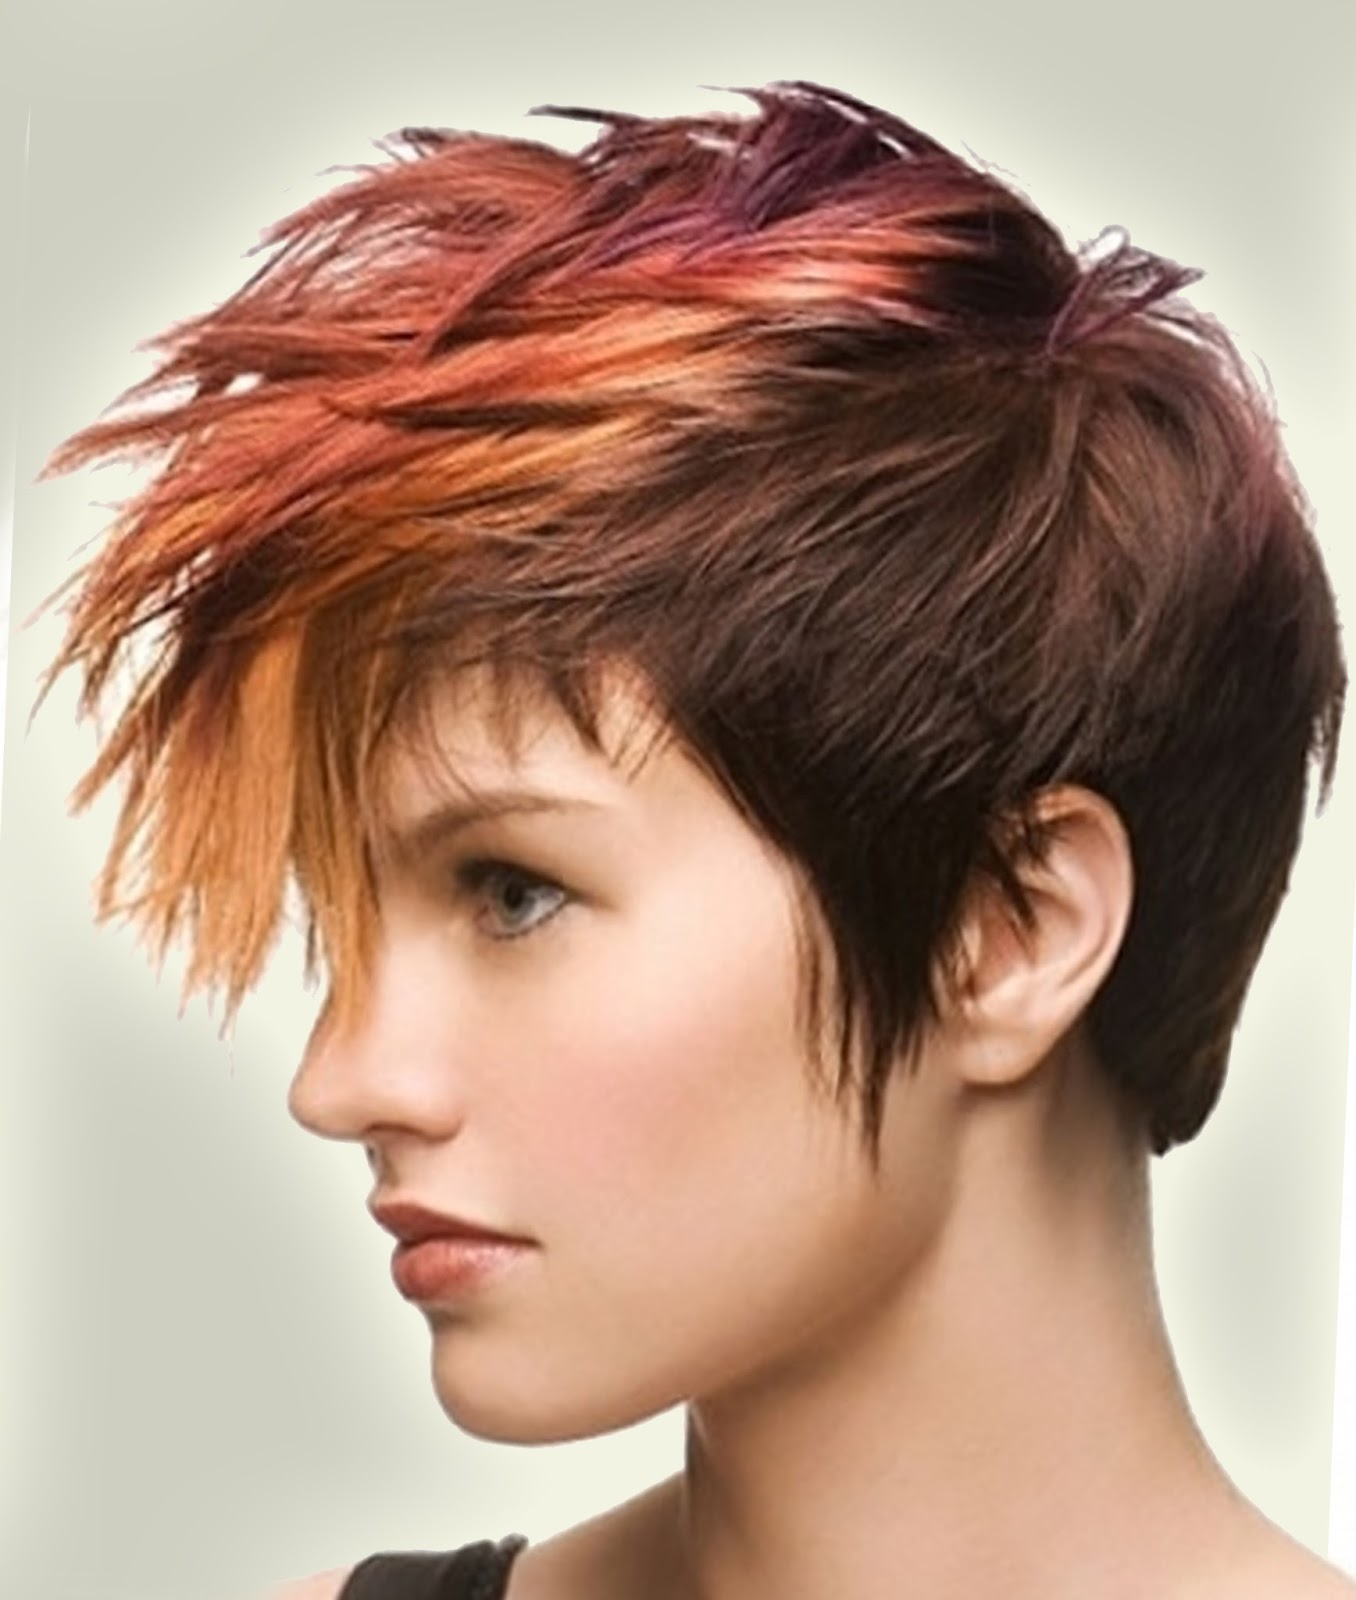 Mohawk Hairstyles For Women: Modern Look!   Hairstyles Spot